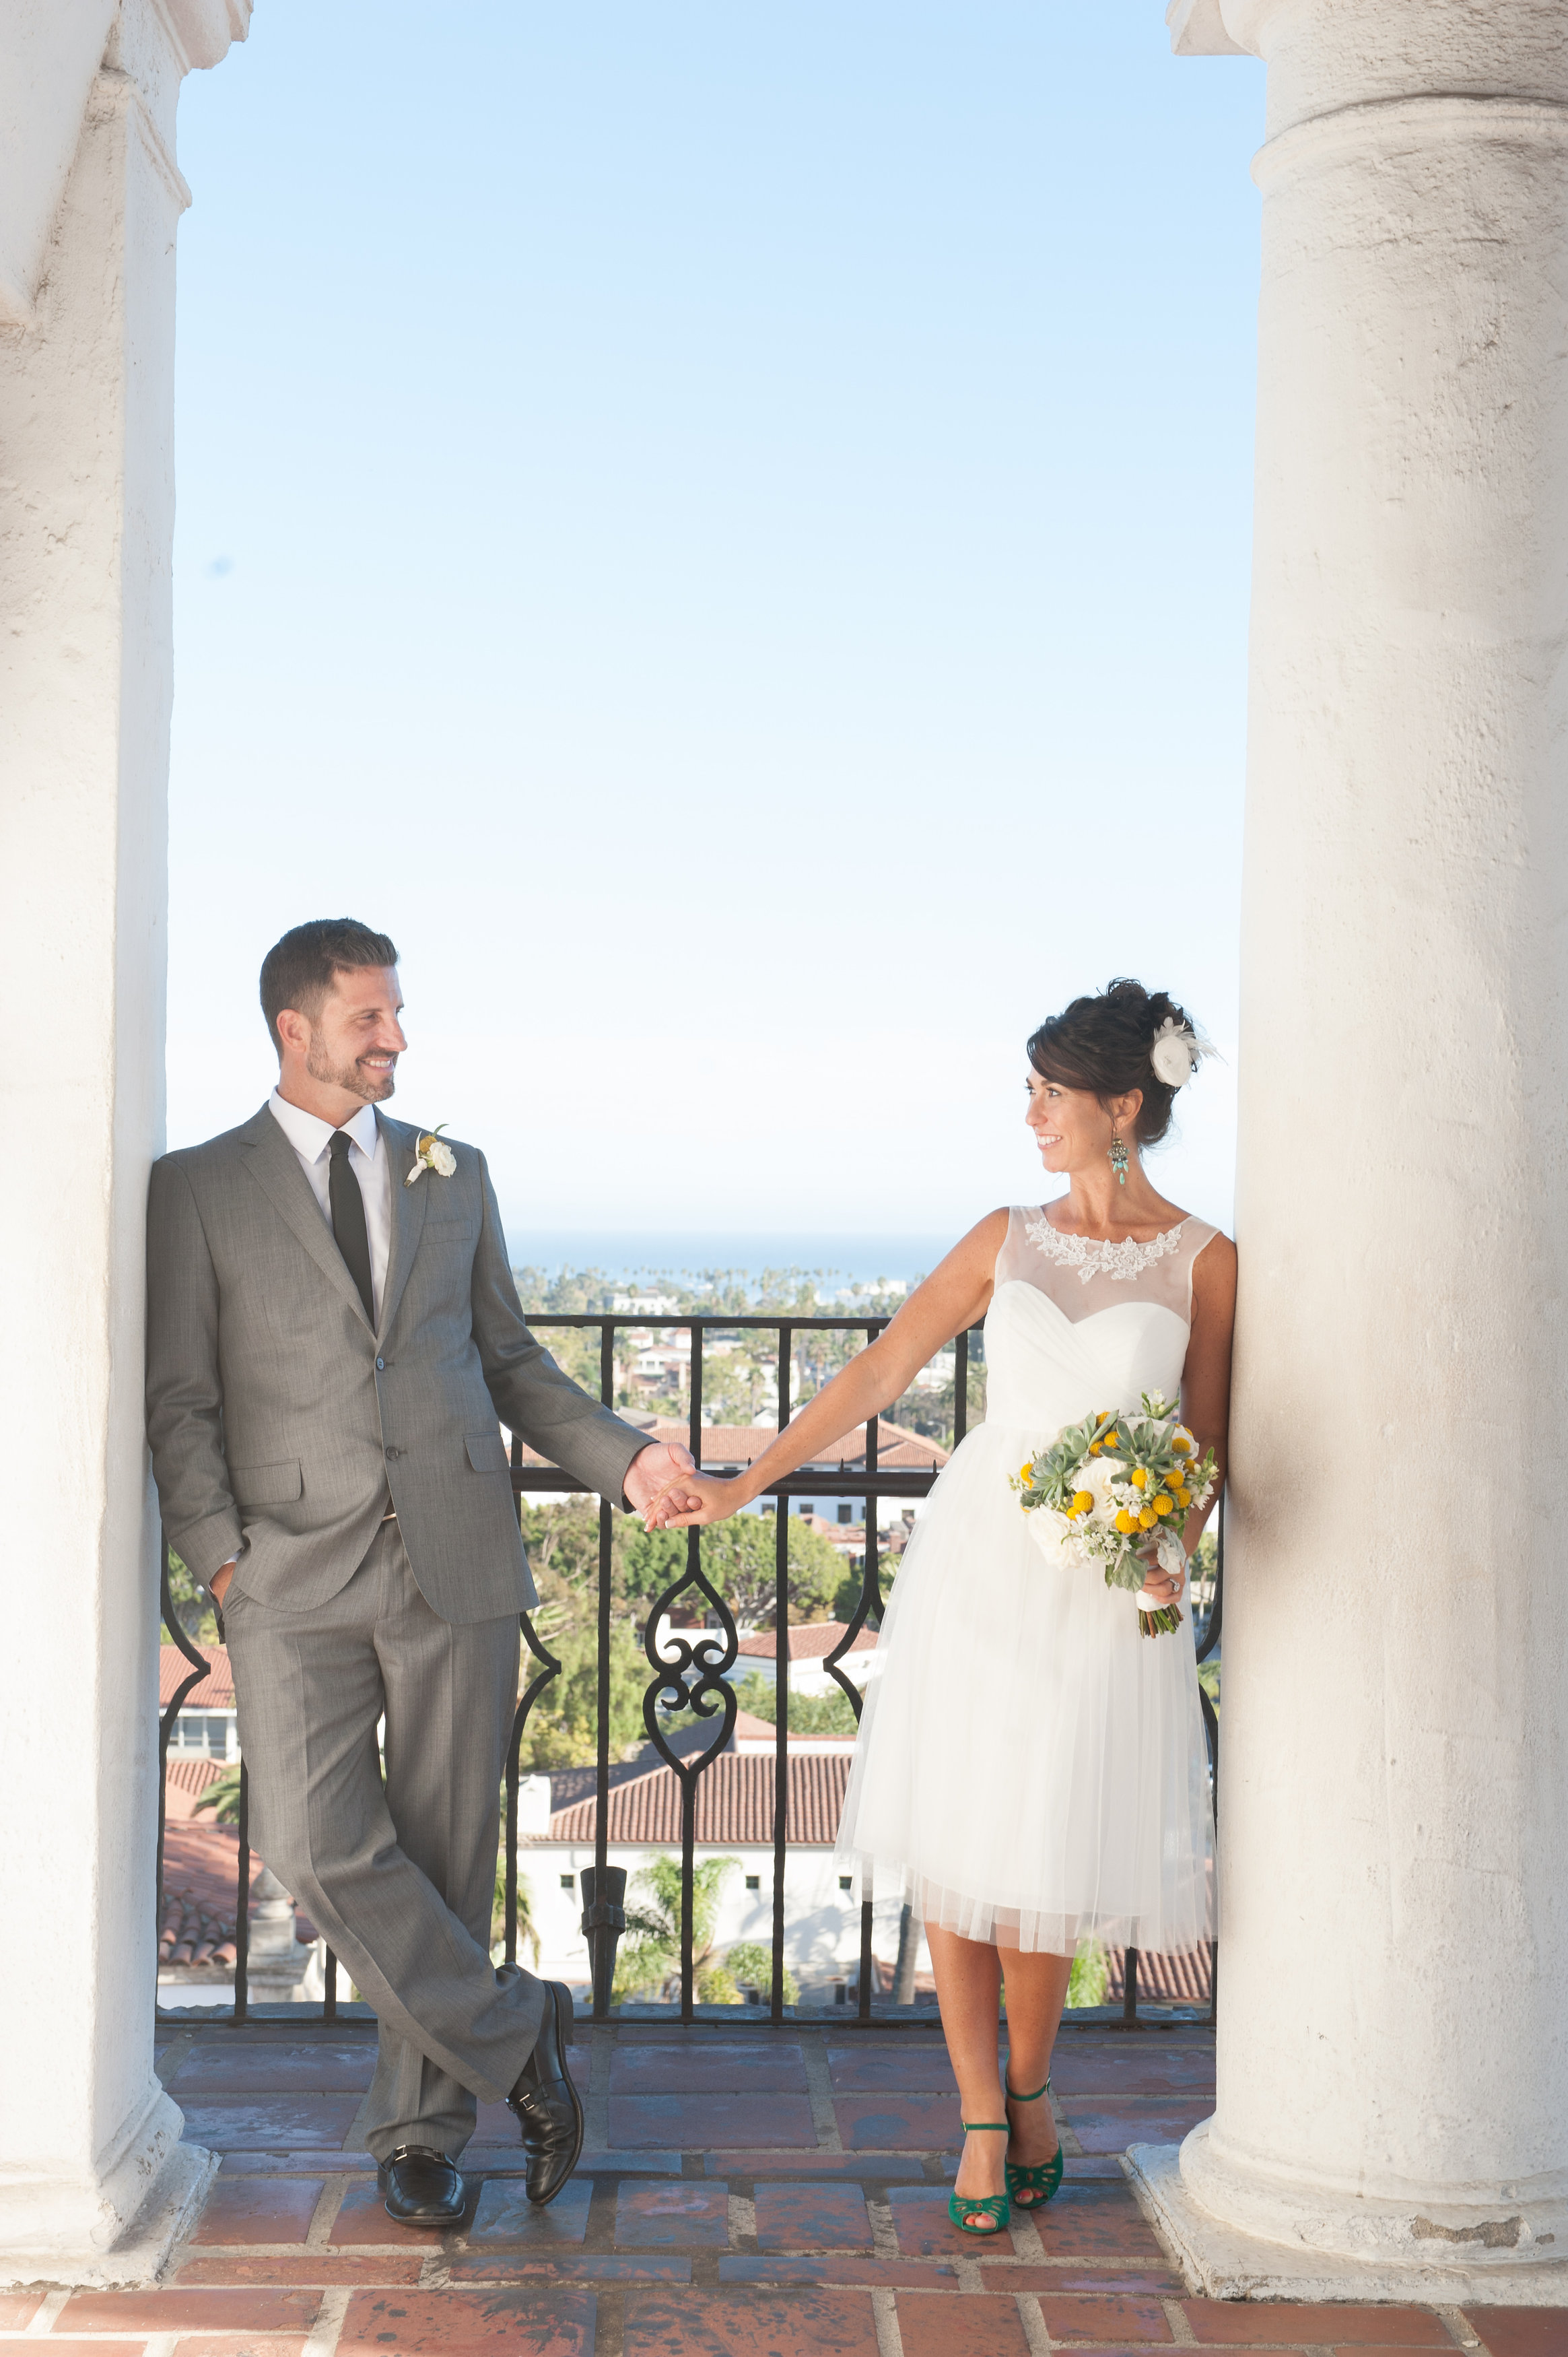 www.santabarbarawedding.com   Santa Barbara Courthouse   Photo: By Cherry Photography   elopement locations